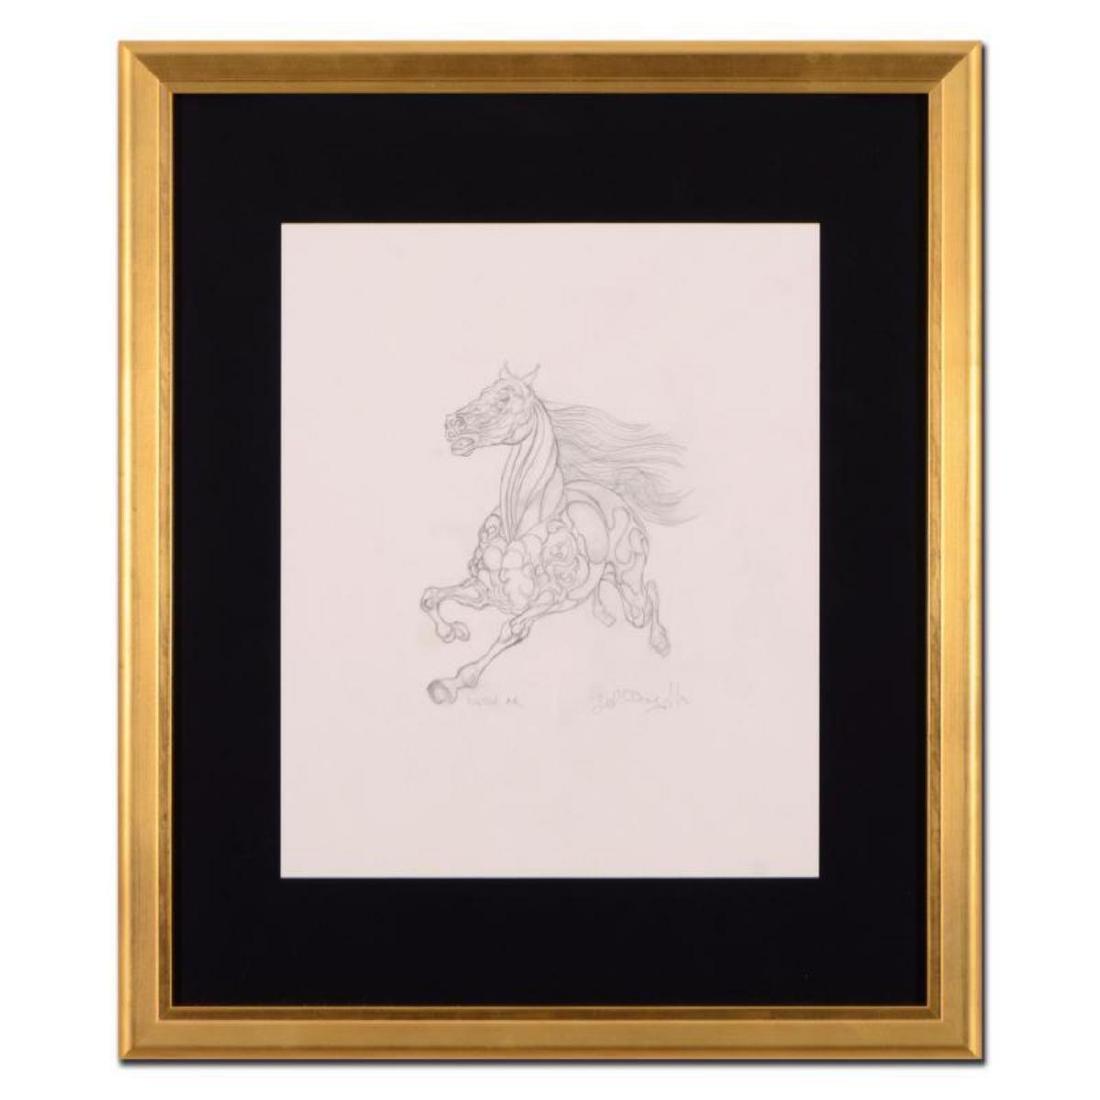 "Guillaume Azoulay - ""AR Sketch"" Framed Original"